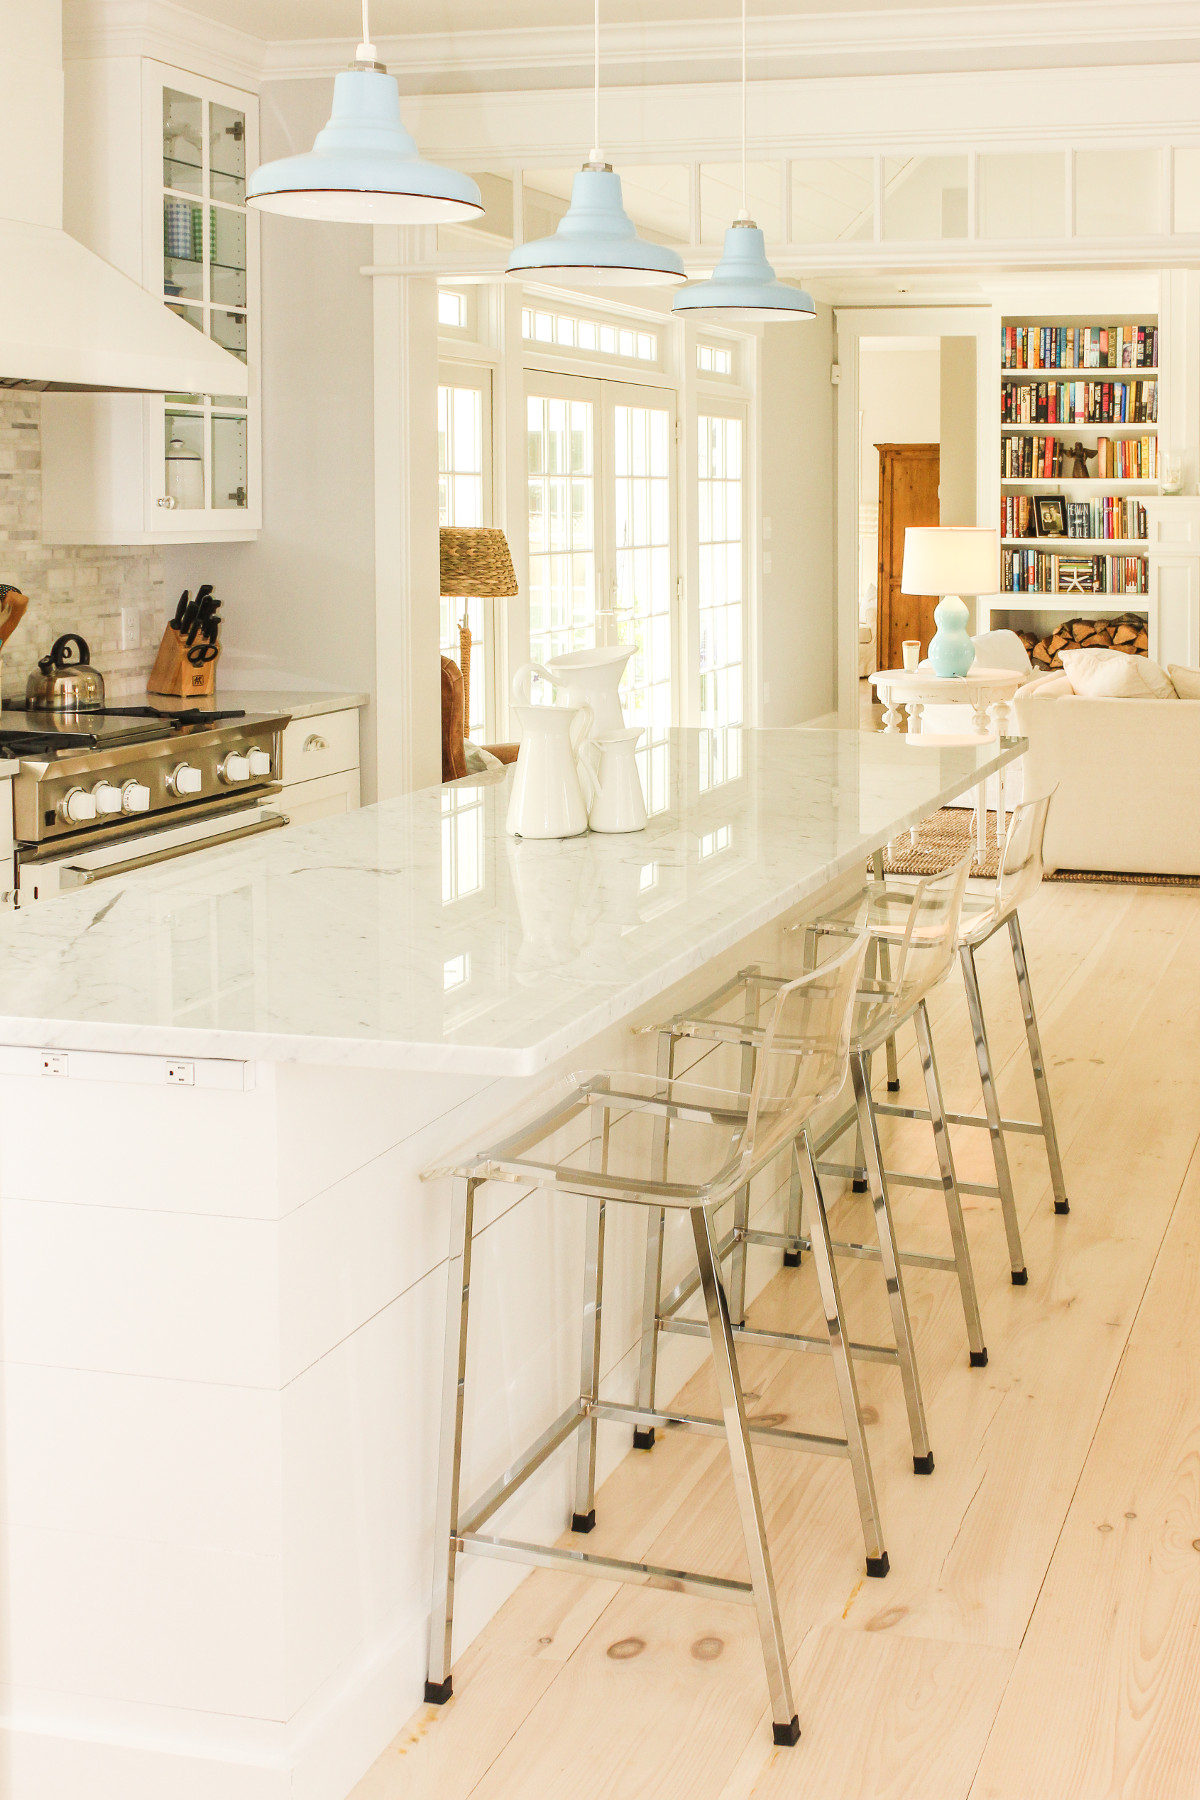 New home Osterville | Lagadinos Building & Design Inc.